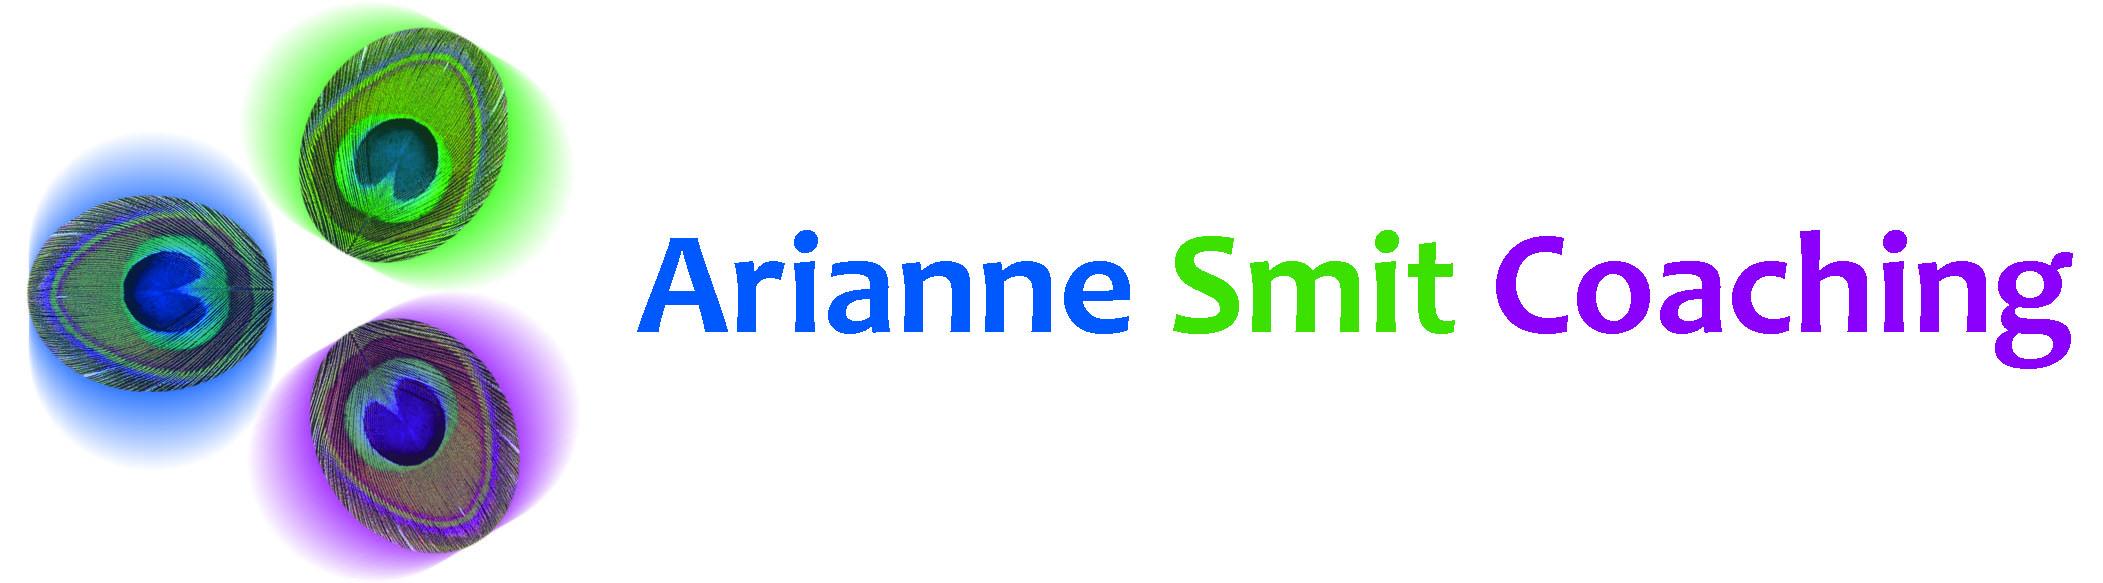 Arianne Smit Coaching